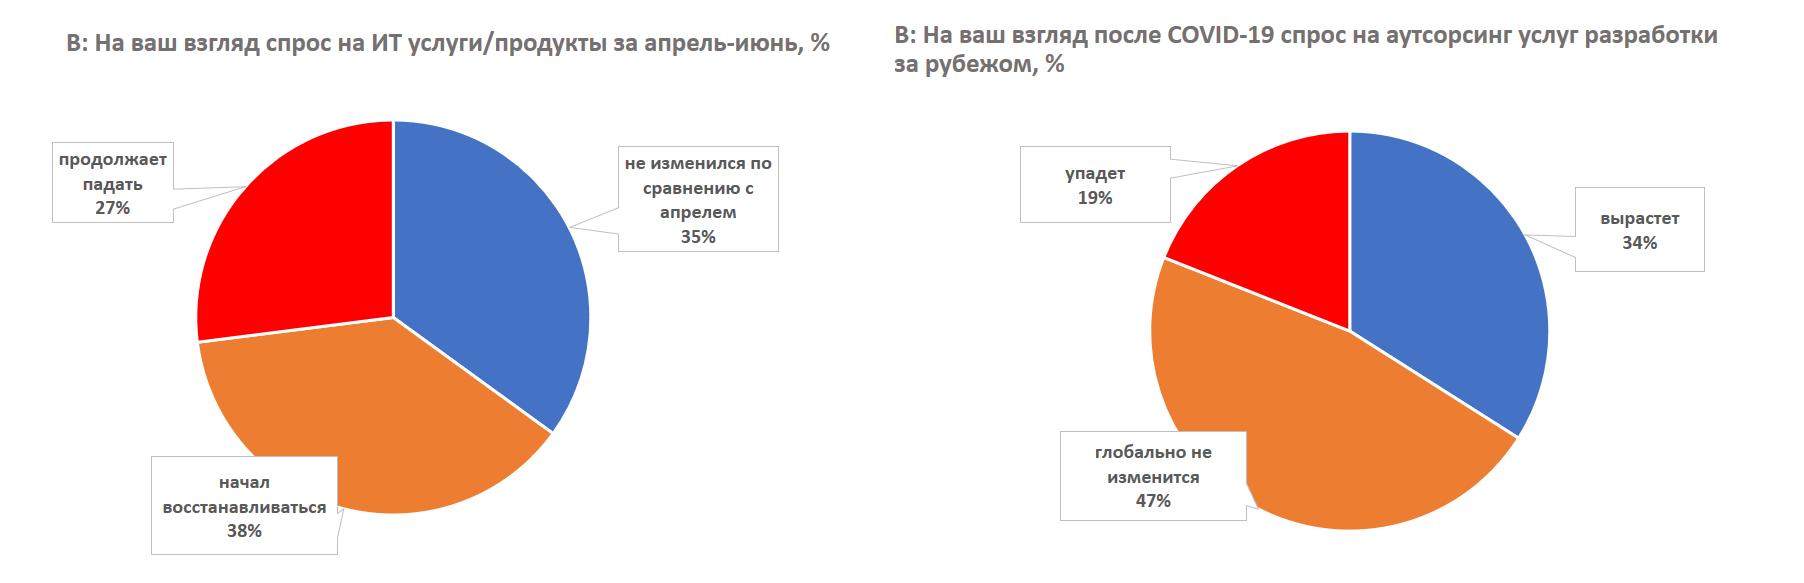 Сравнение графиков влияние коронакризиса на финансовове состояние ИТ компаний